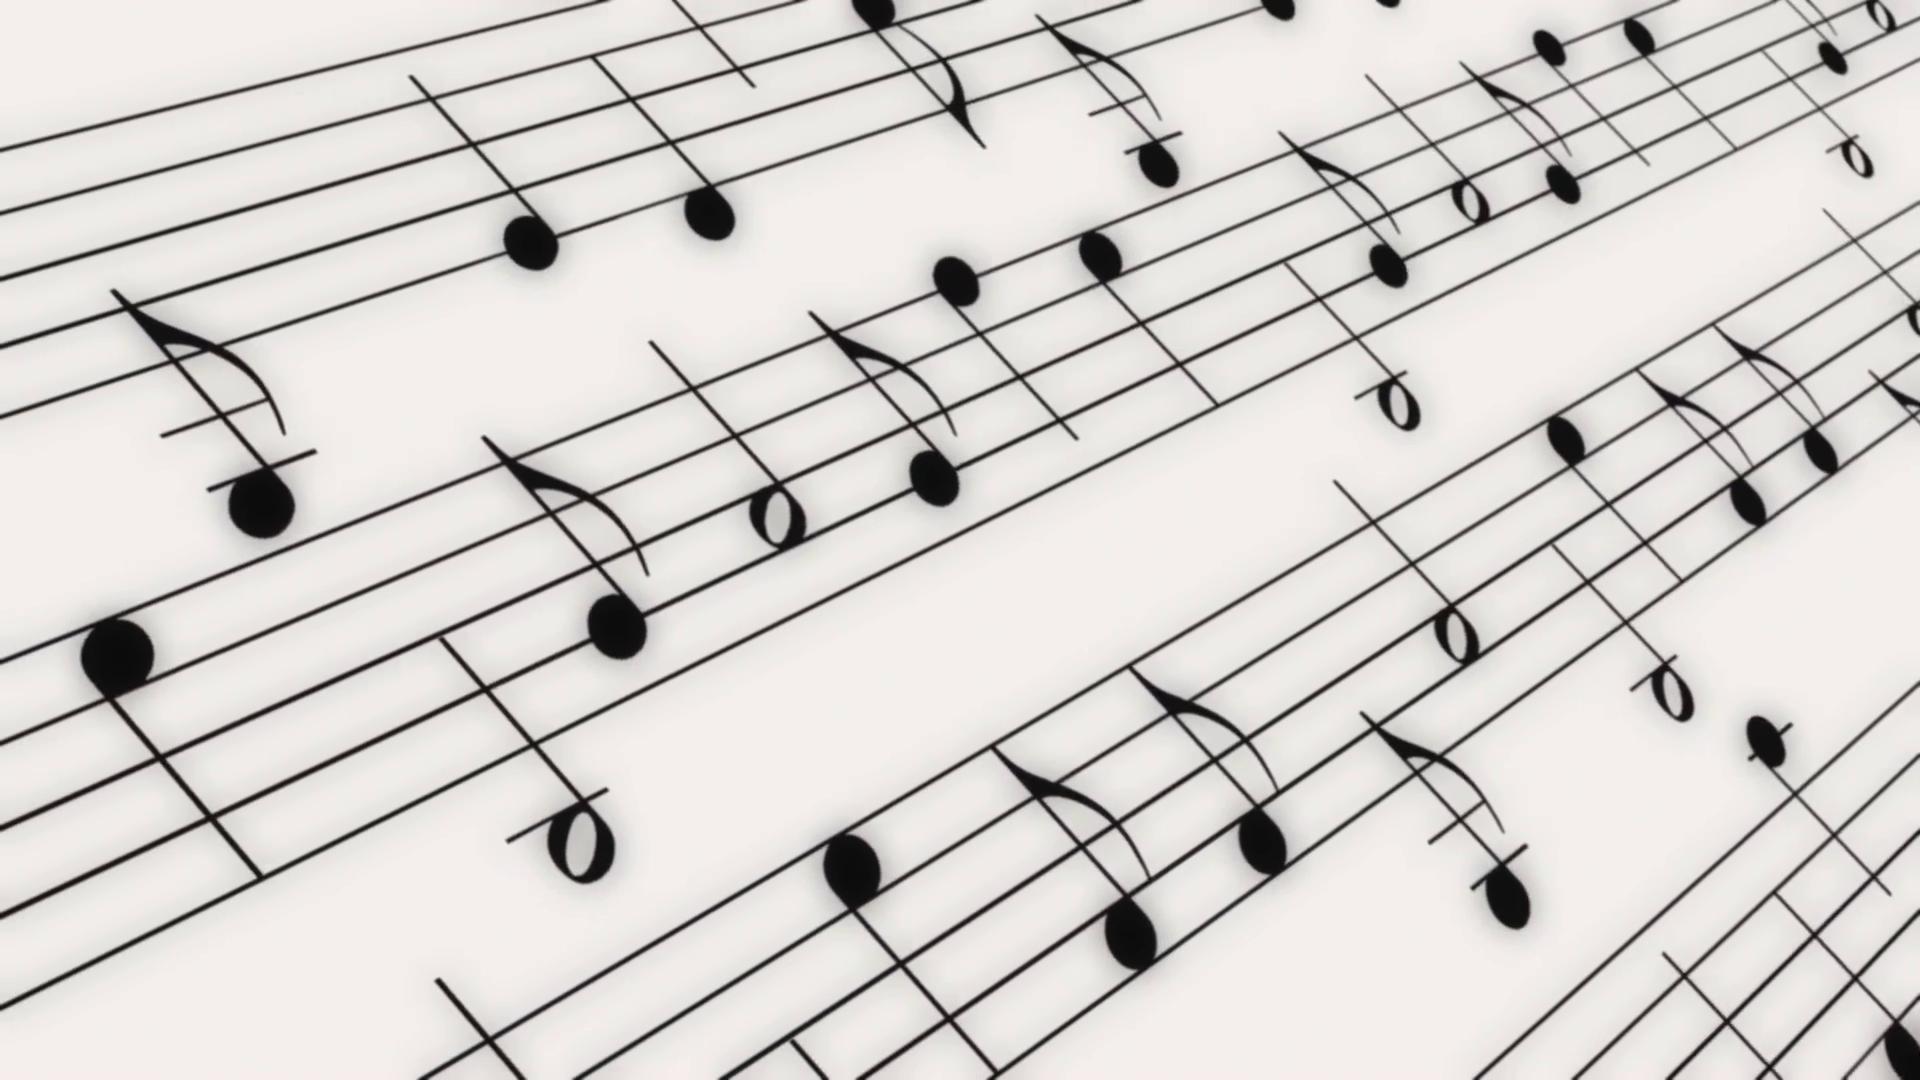 Music 1920x1080